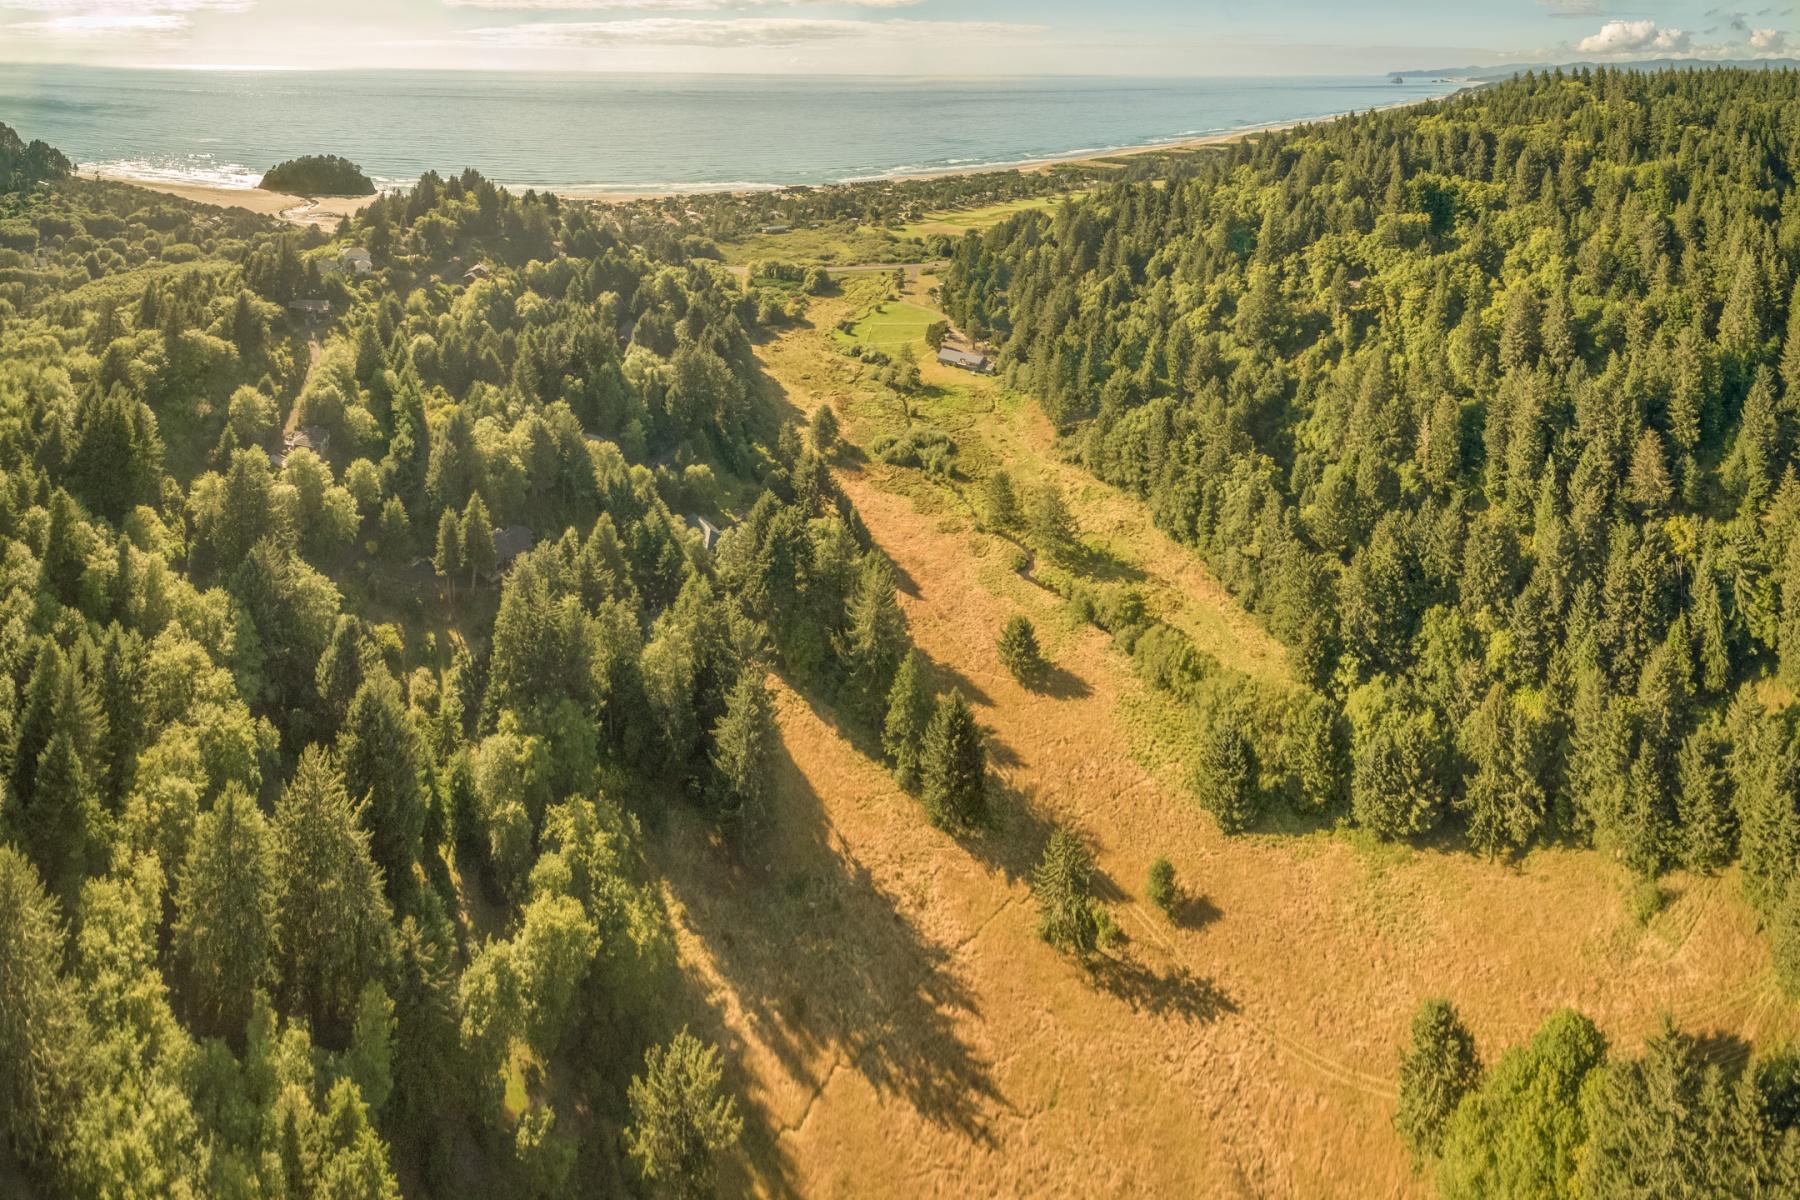 Đất đai vì Bán tại 0 SCHOOLHOUSE RD, NESKOWIN Neskowin, Oregon, 97149 Hoa Kỳ